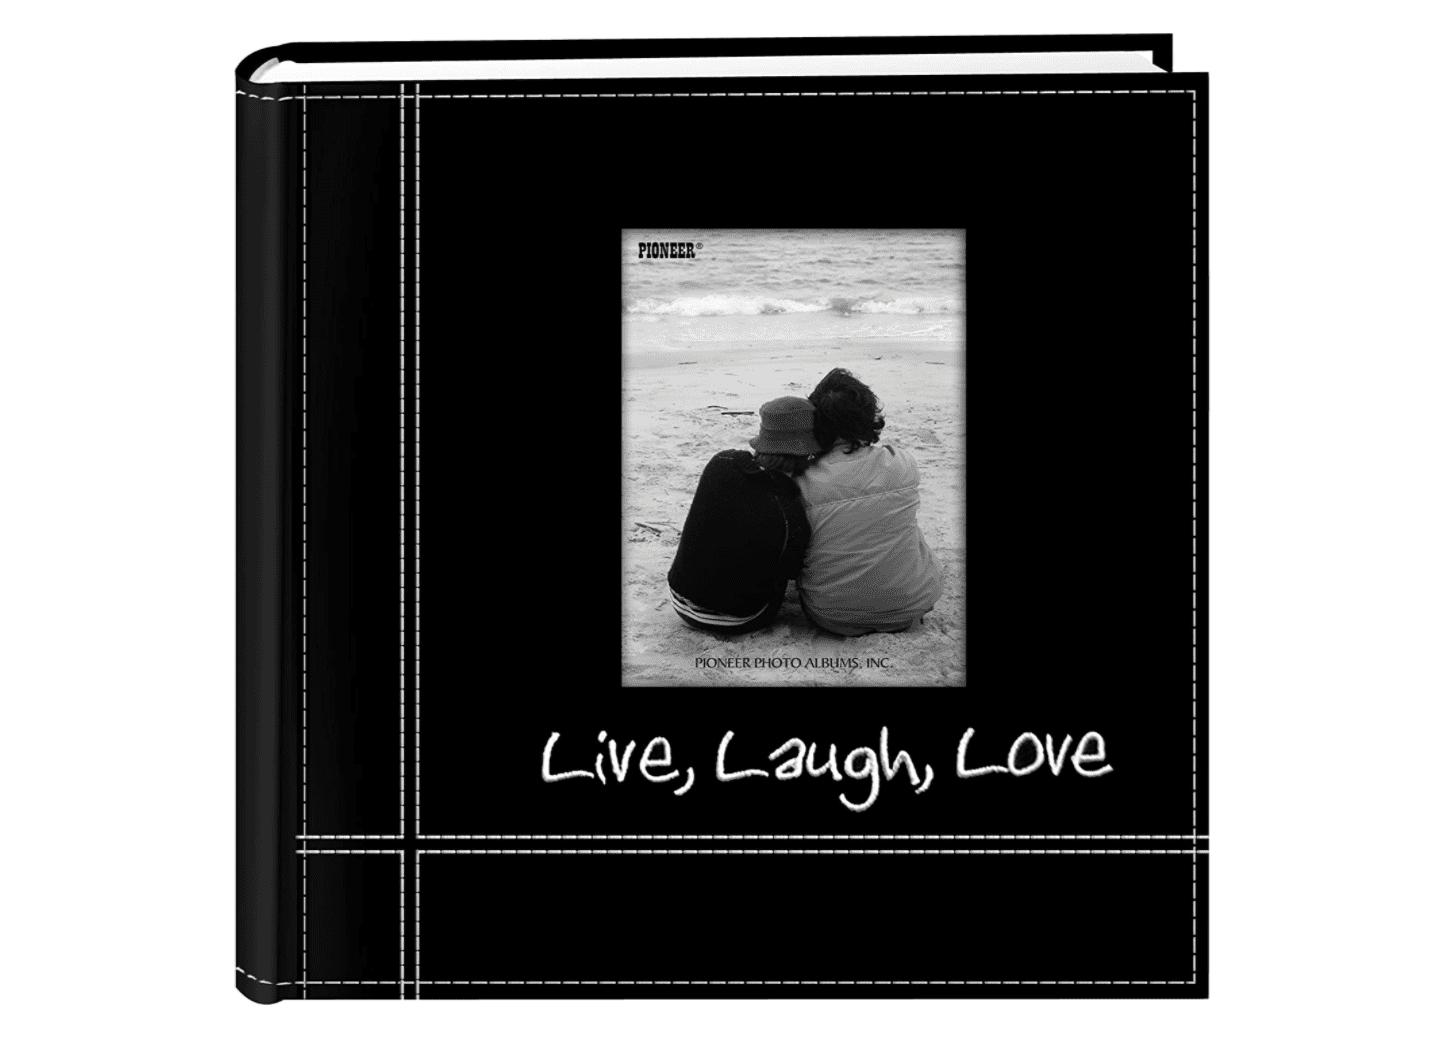 Pioneer Live, Laugh, Love Photo Album Embroidered